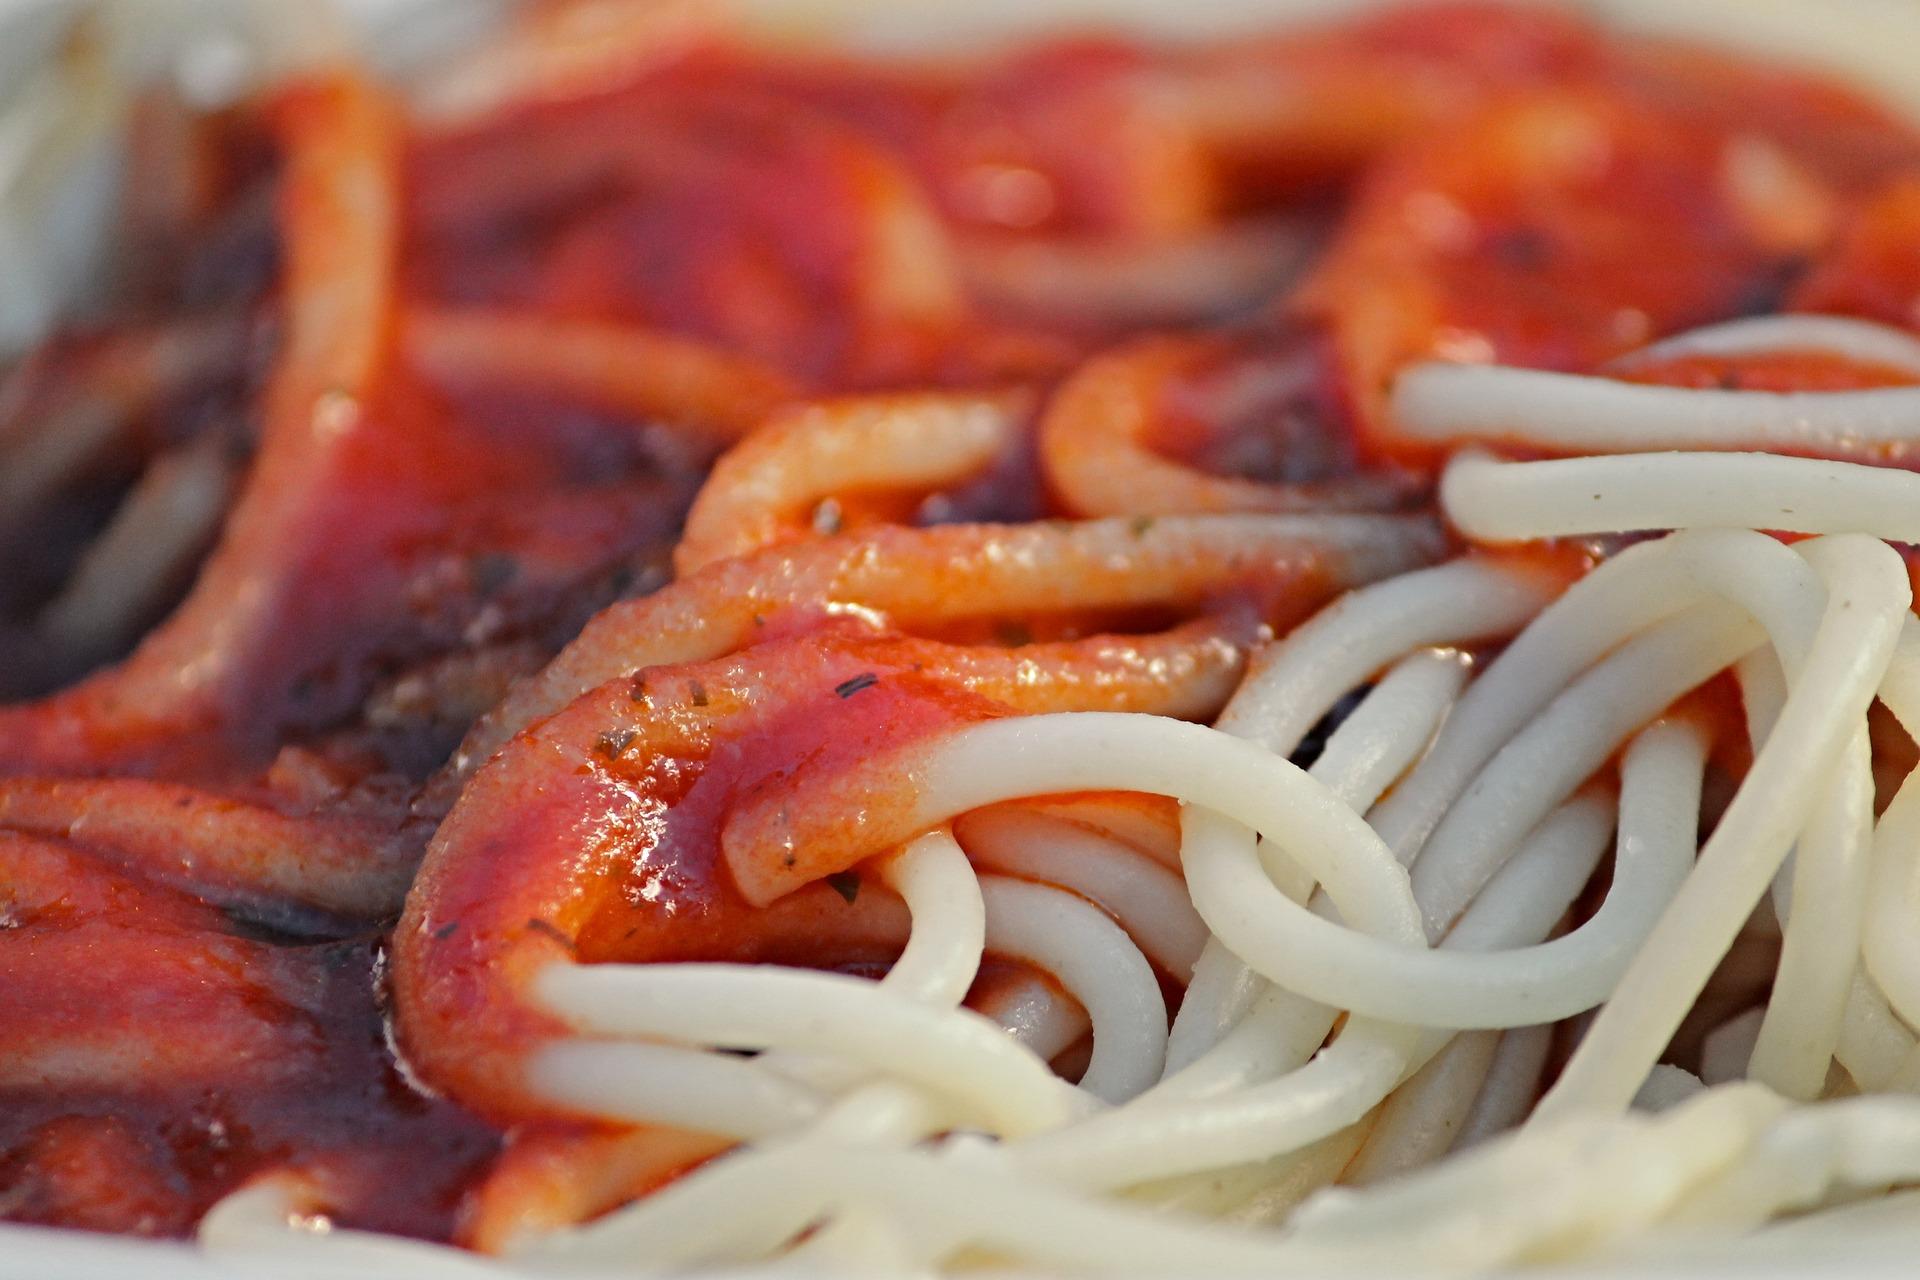 Tomato Sauce and Spaghetti